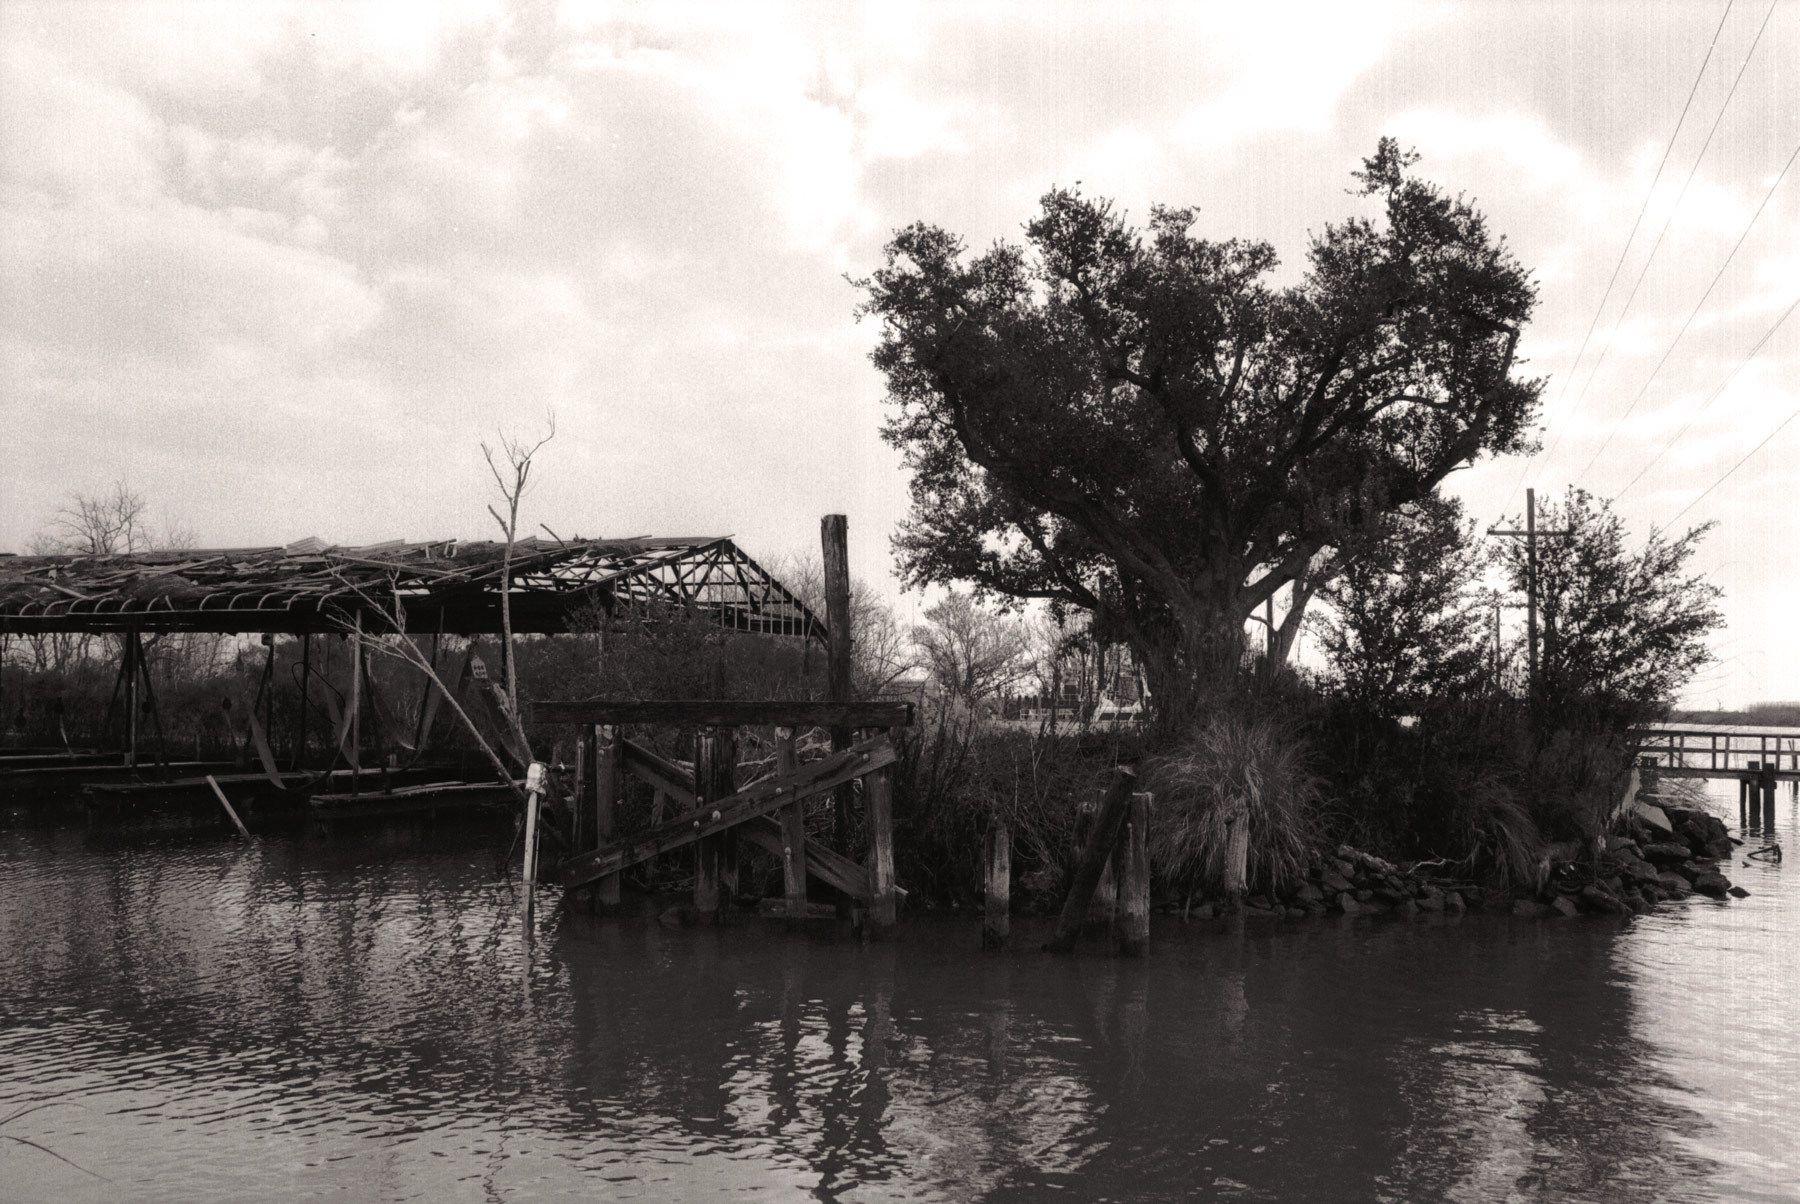 Abandoned Boat Docks, Delacroix, LA 2011